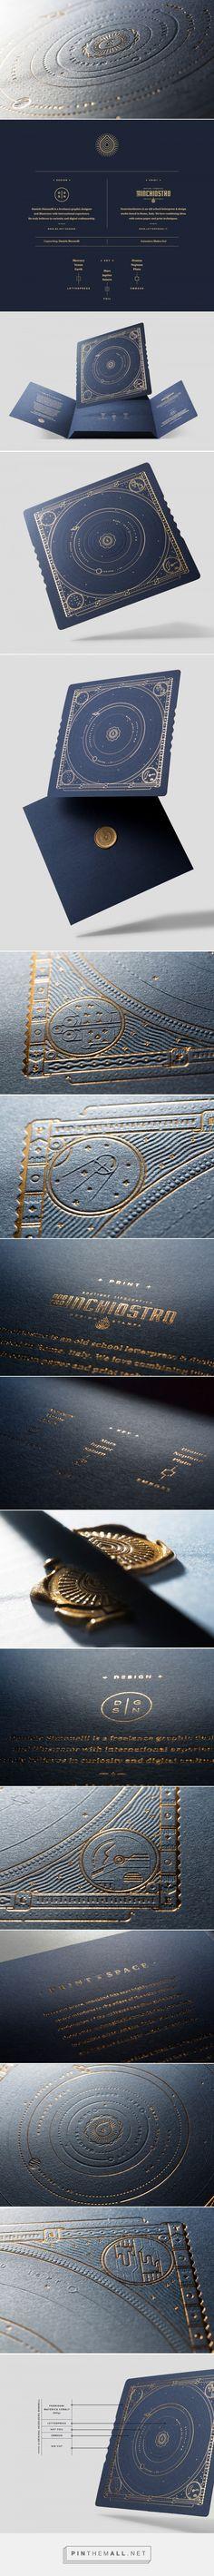 Print & Space self promotion packaging design by Daniele Simonelli Design - https://www.packagingoftheworld.com/2018/06/print-space.html